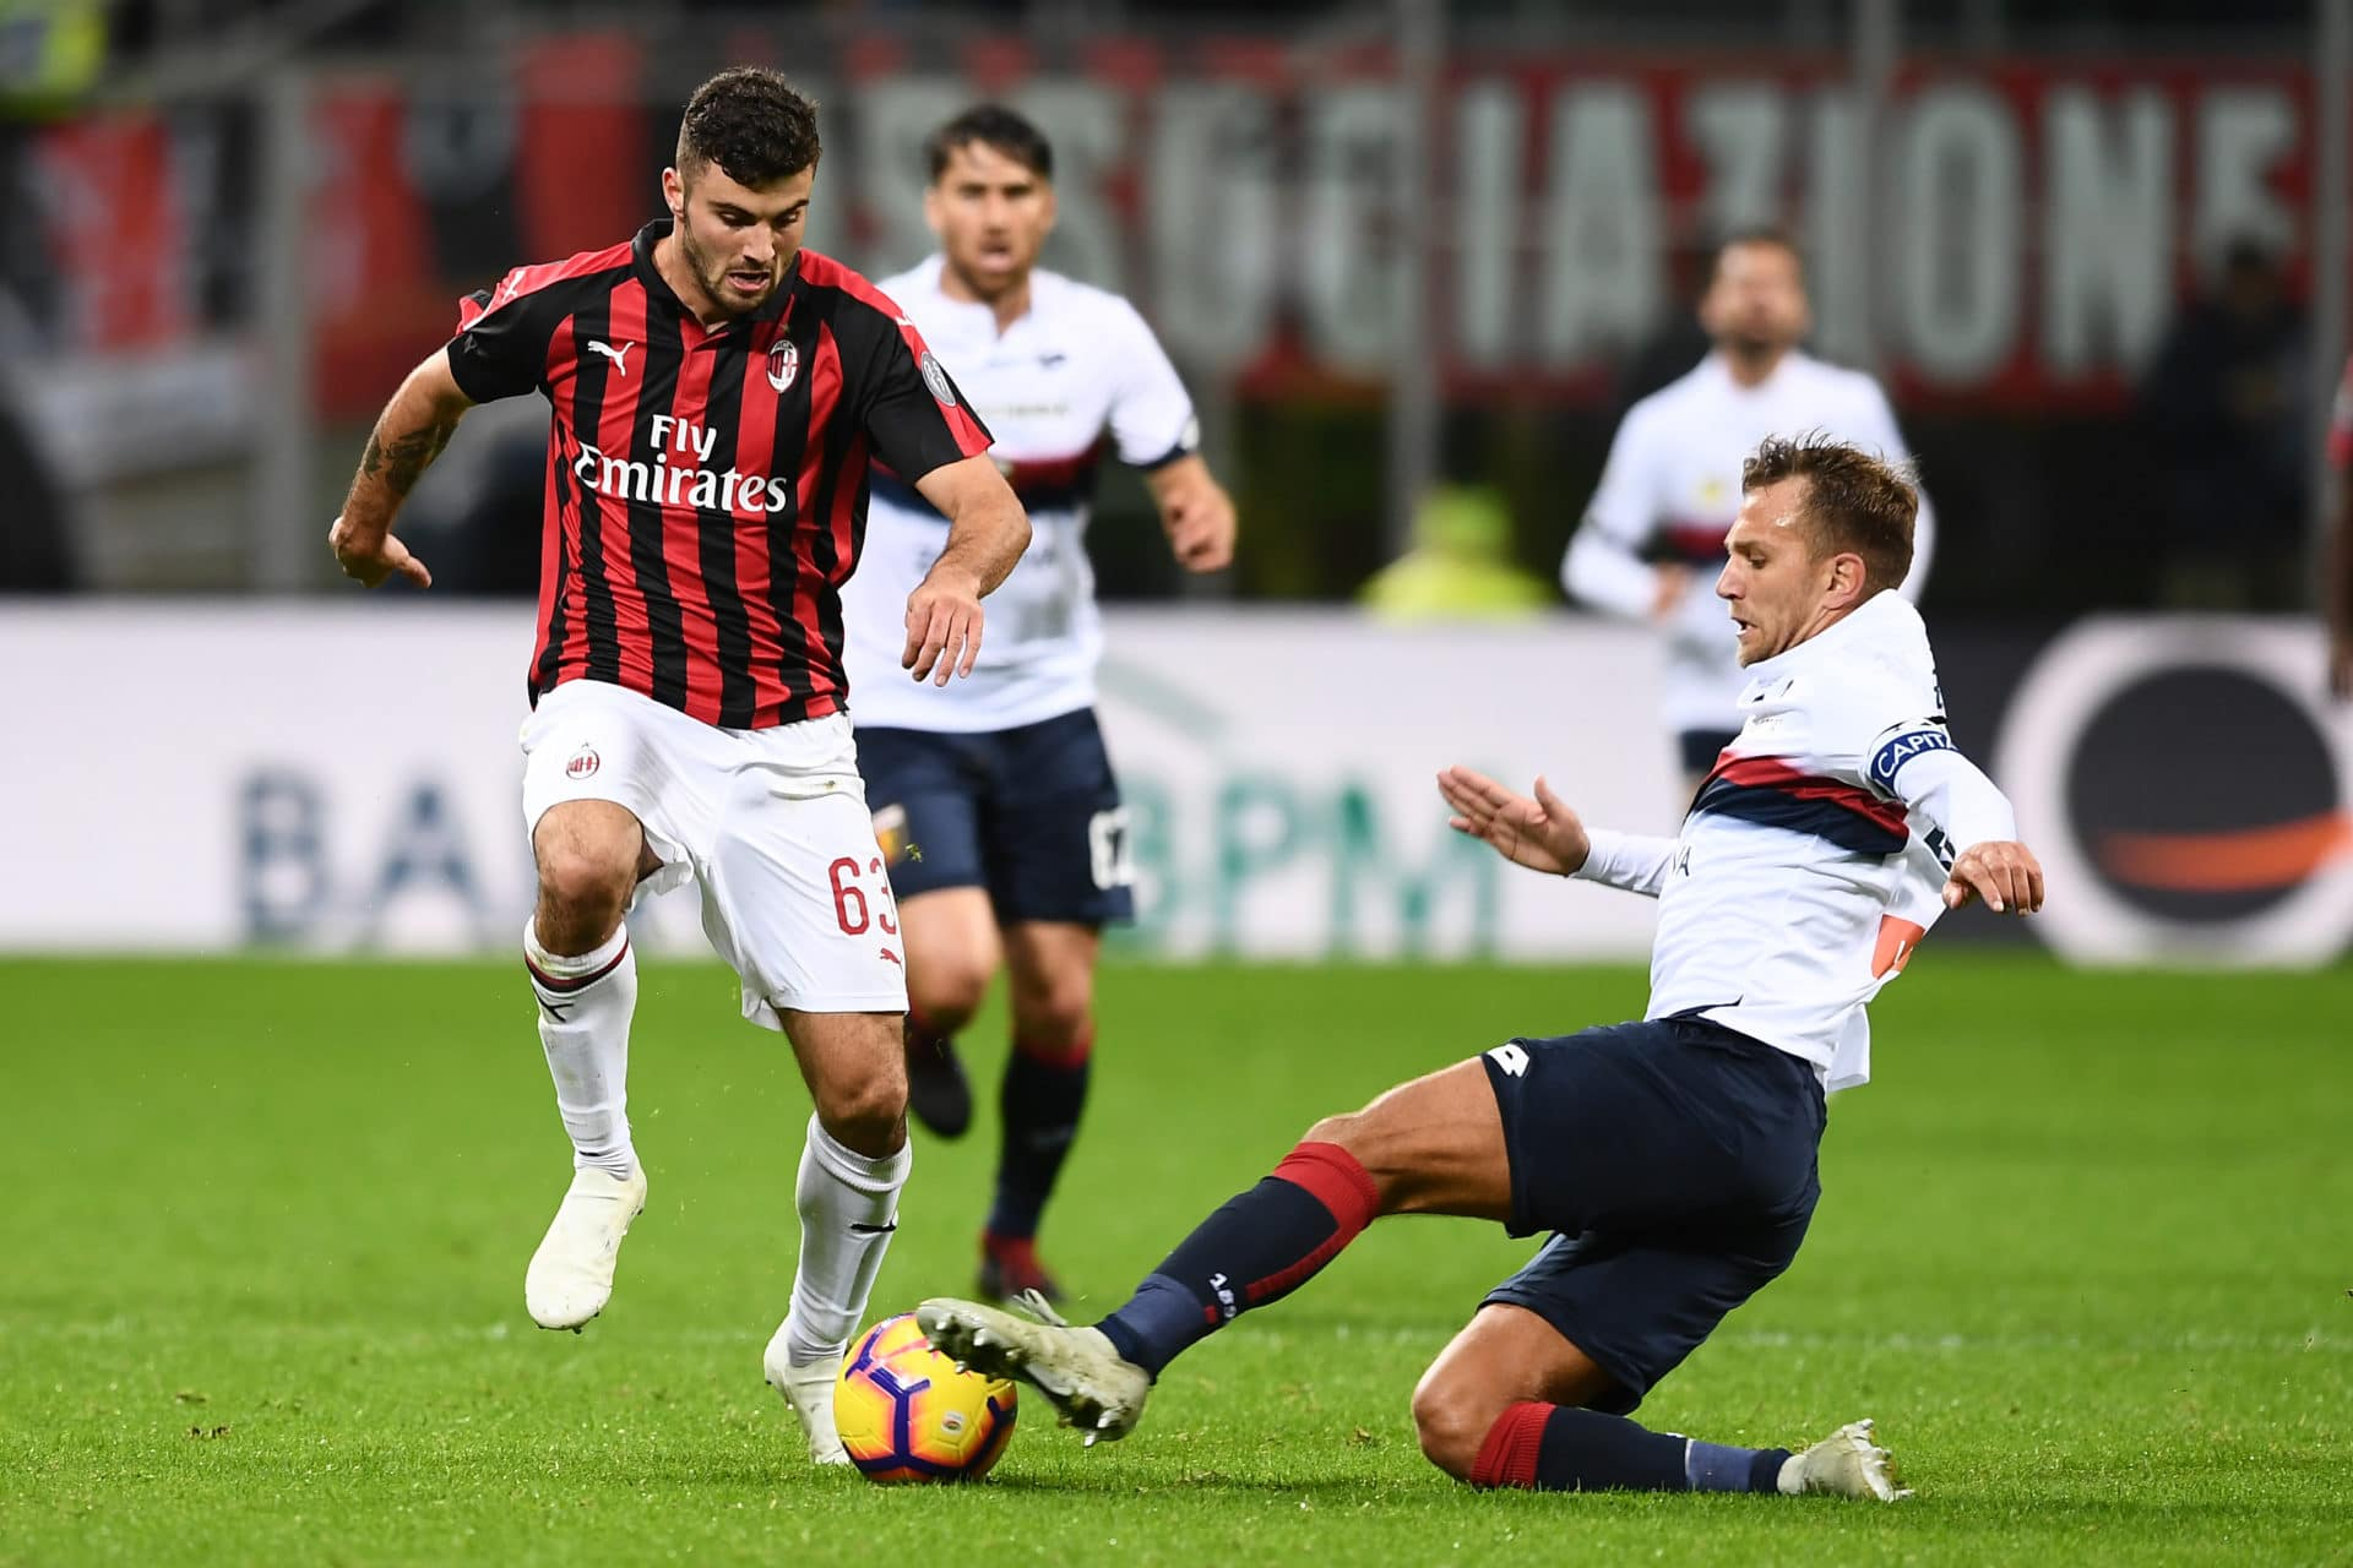 Serie A, Milan-Genoa 2-1: decide Romagnoli all'ultimo respiro